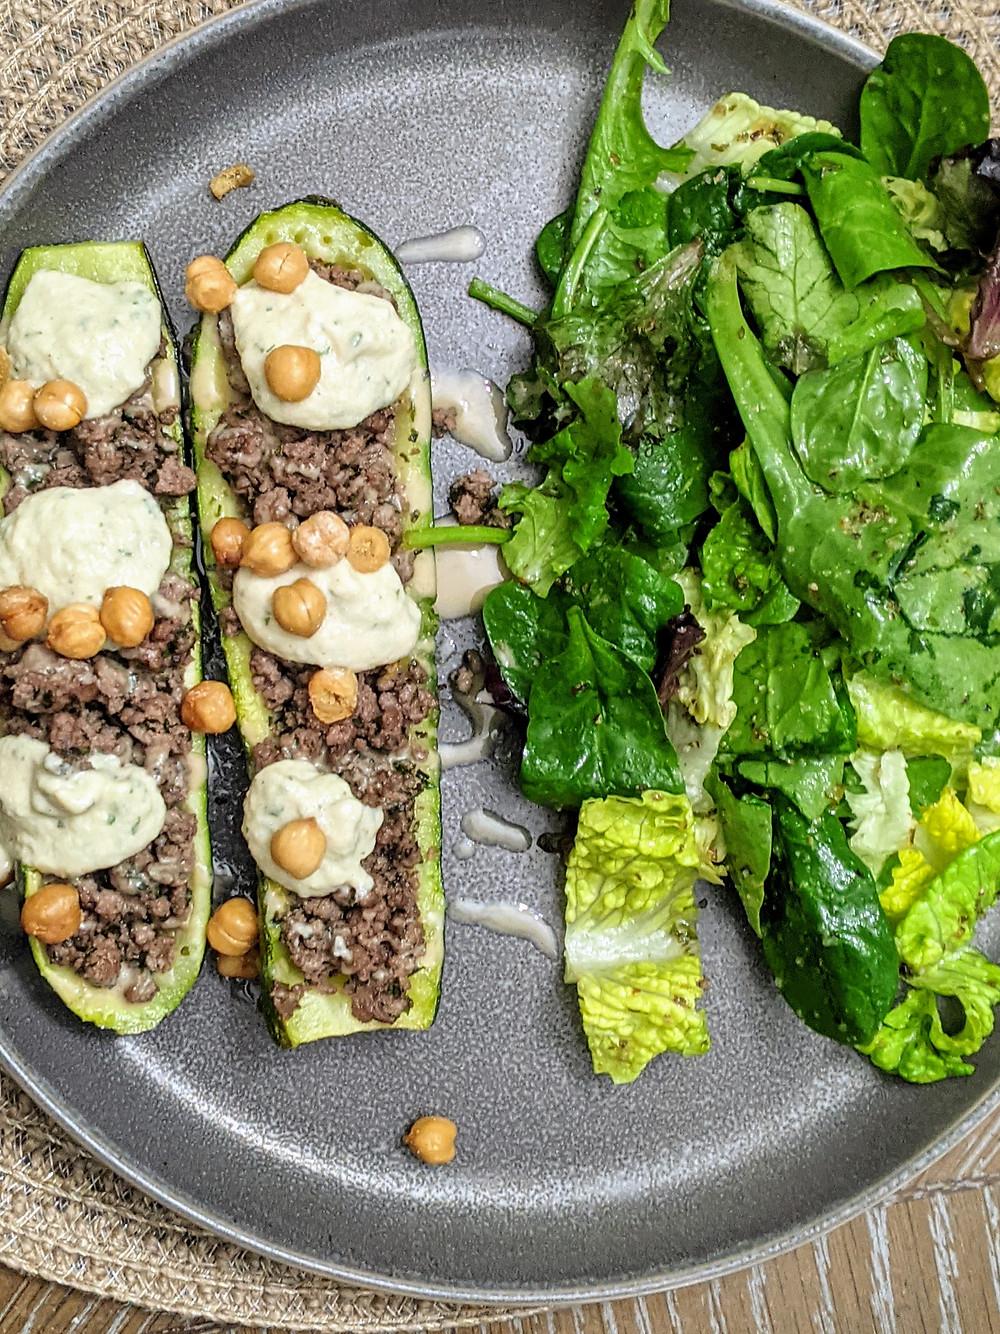 Mediterranean-Inspired Zucchini Taco Boats - amanda macgregor - joseph centineo - food allergy recipes